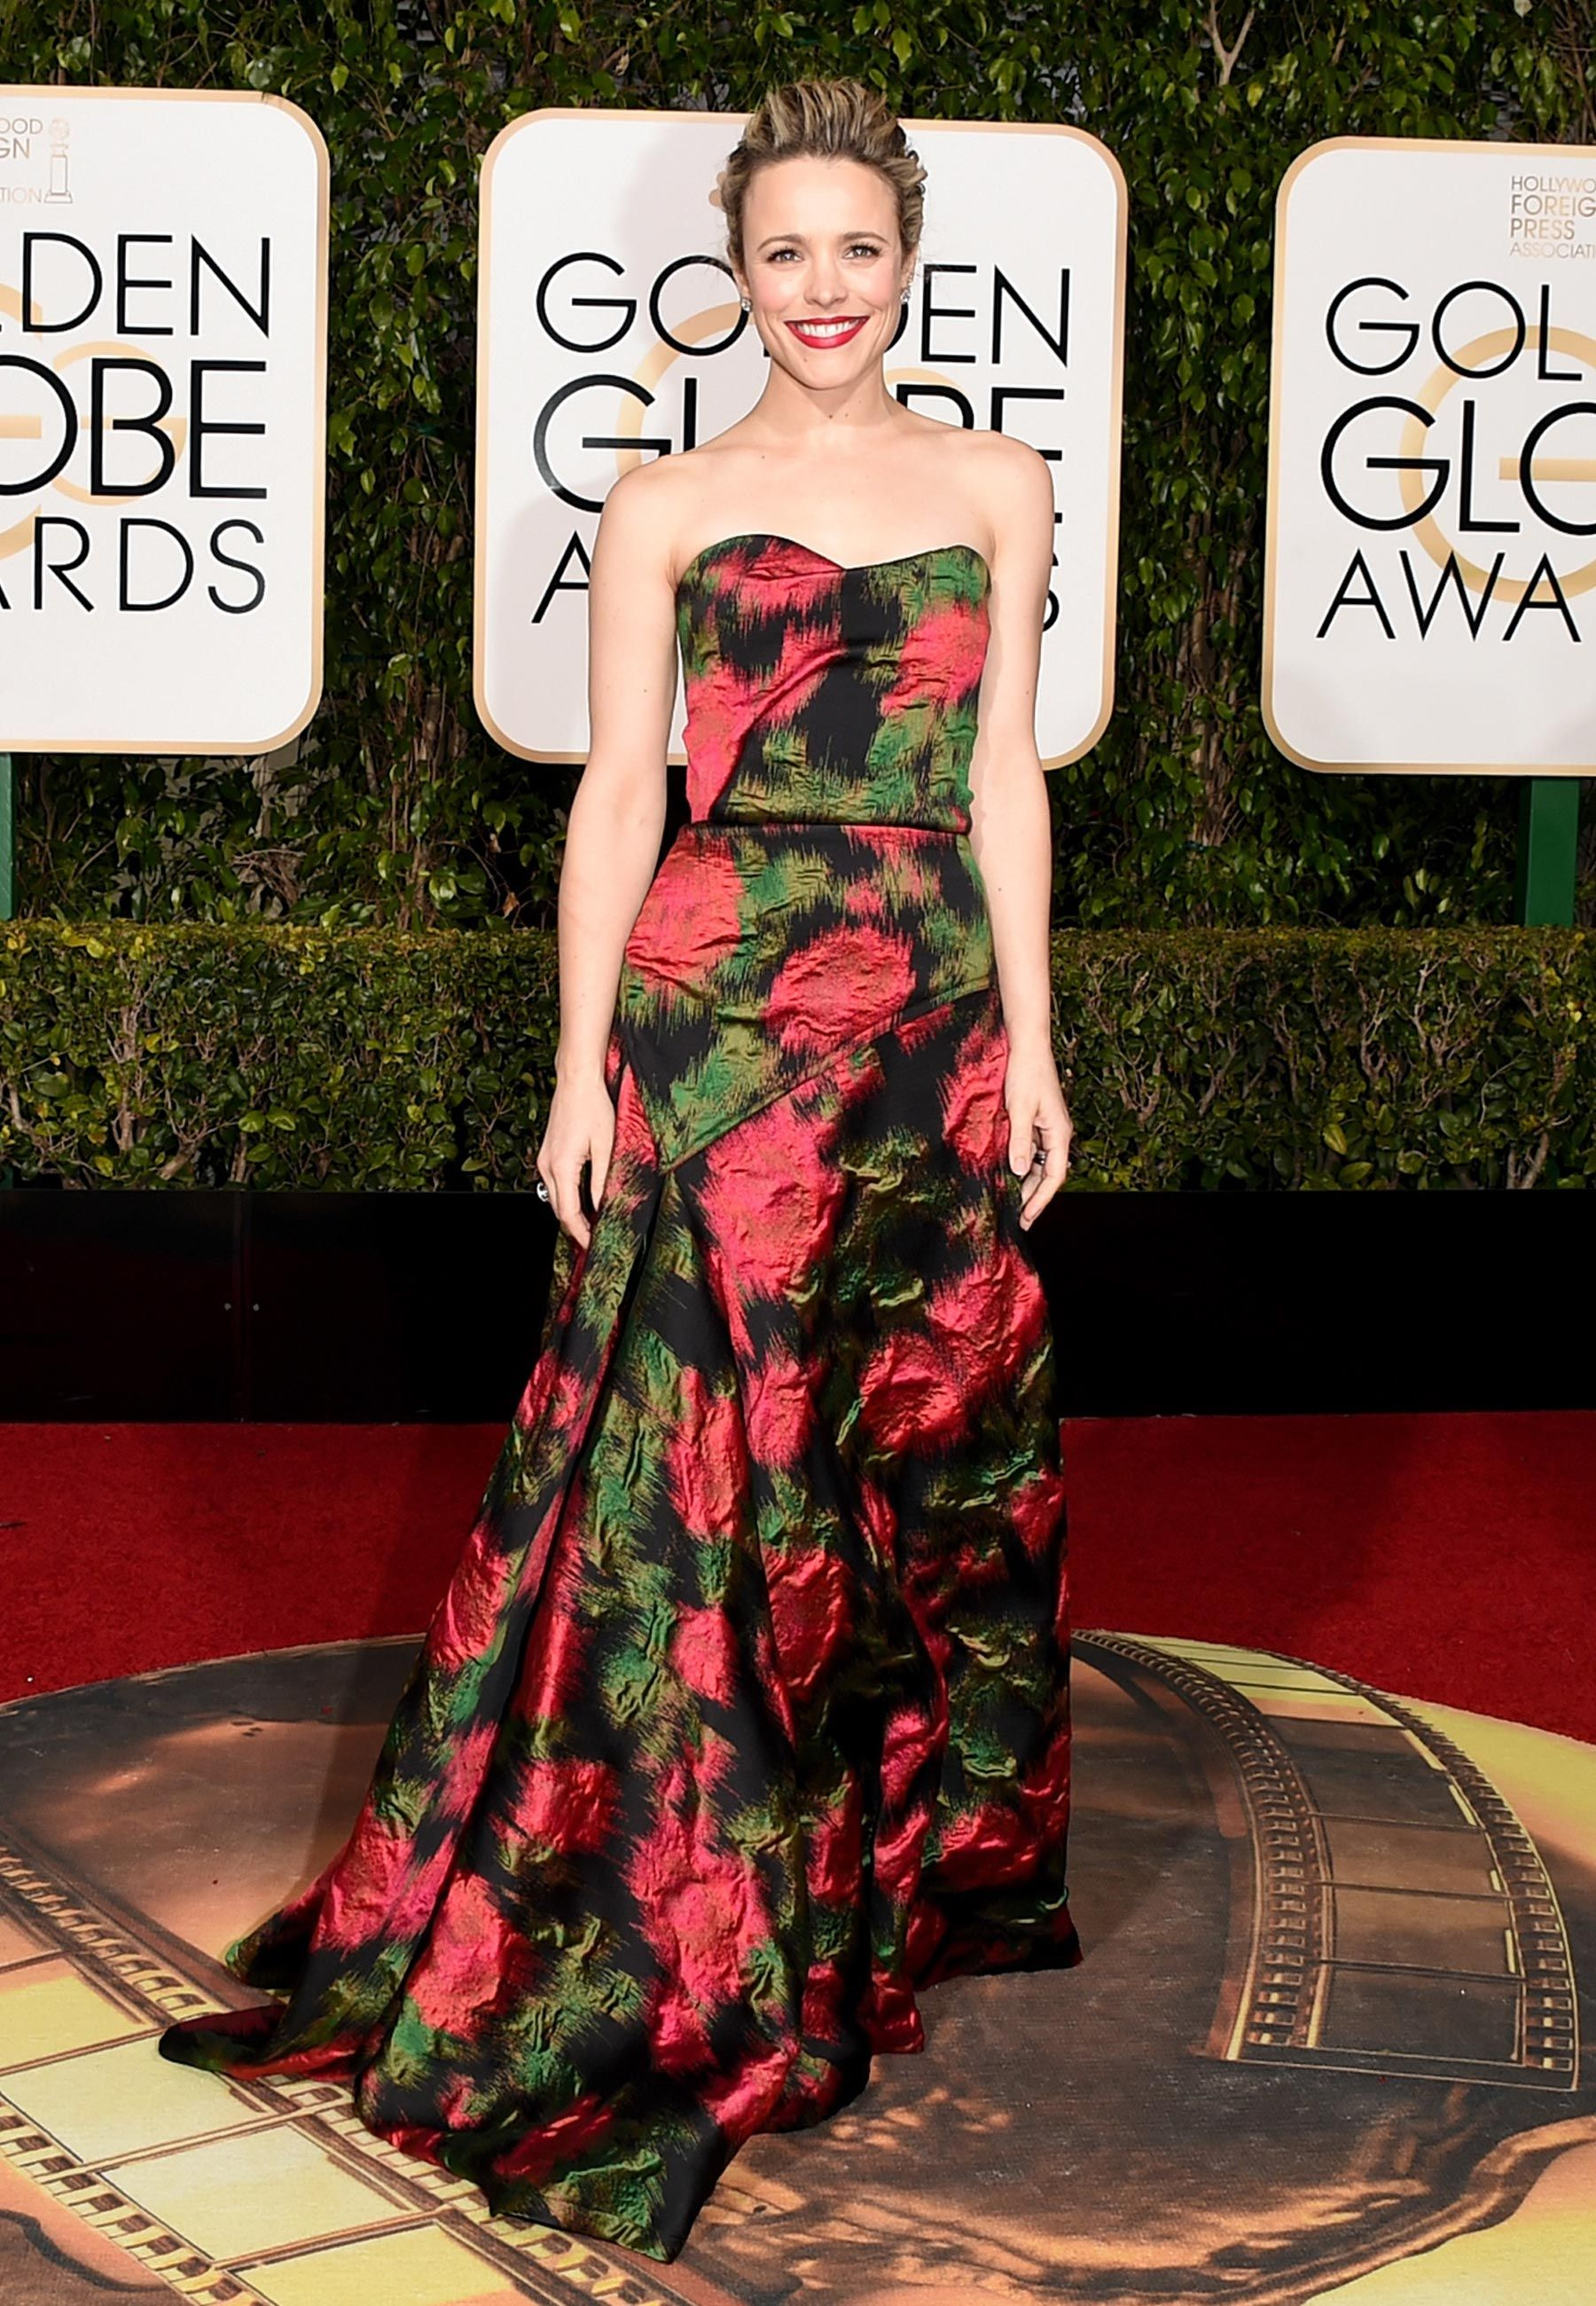 Vestidos do tapete vermelho do Golden Globe Awards 2016 | Vestidos ...